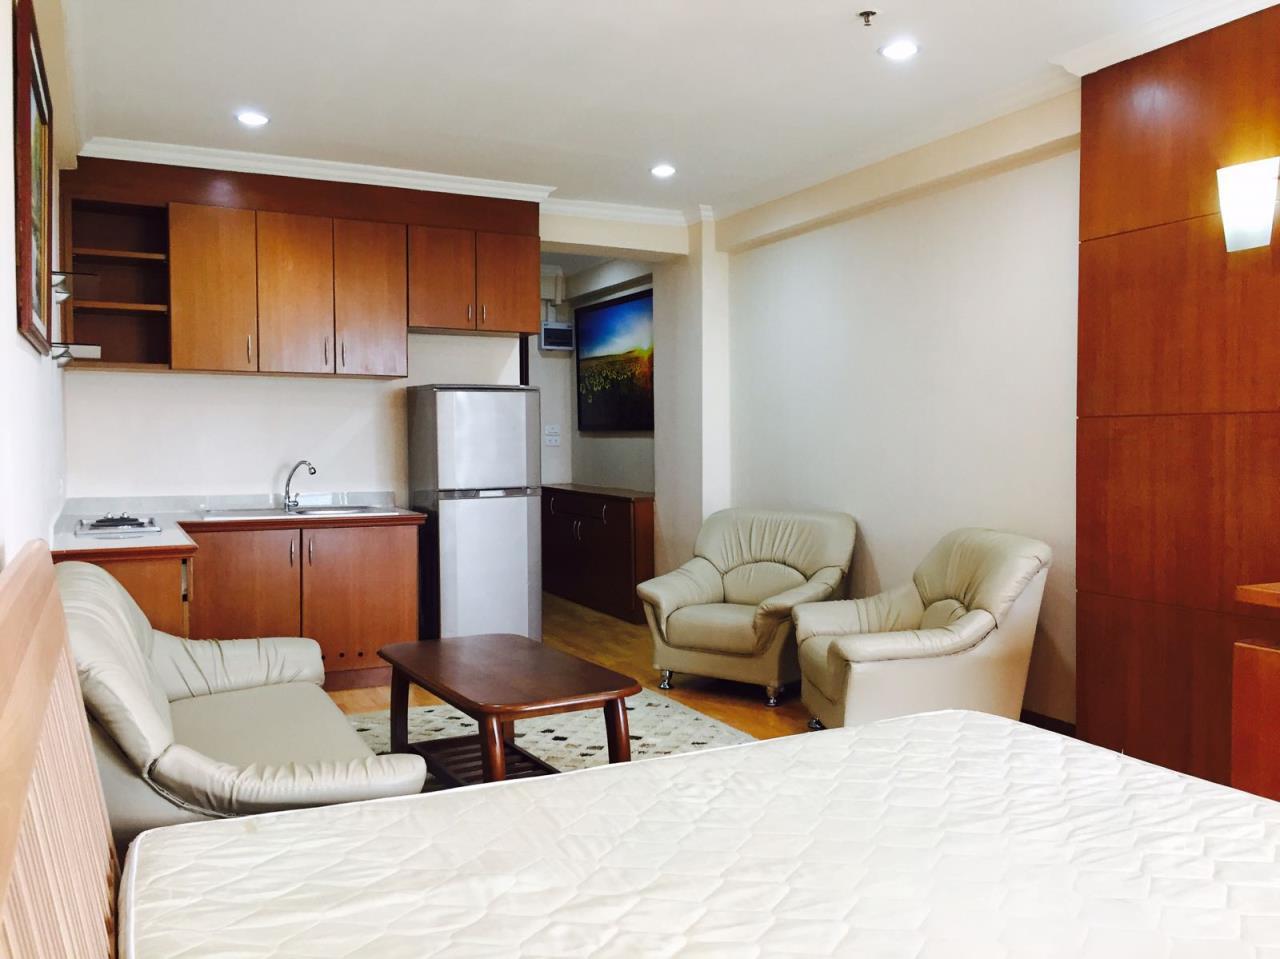 Immobilien Pattaya Agency's Jomtien Beach Condo S2, 32 Sqm. Studio, Sea View, Foreigner Quota 4